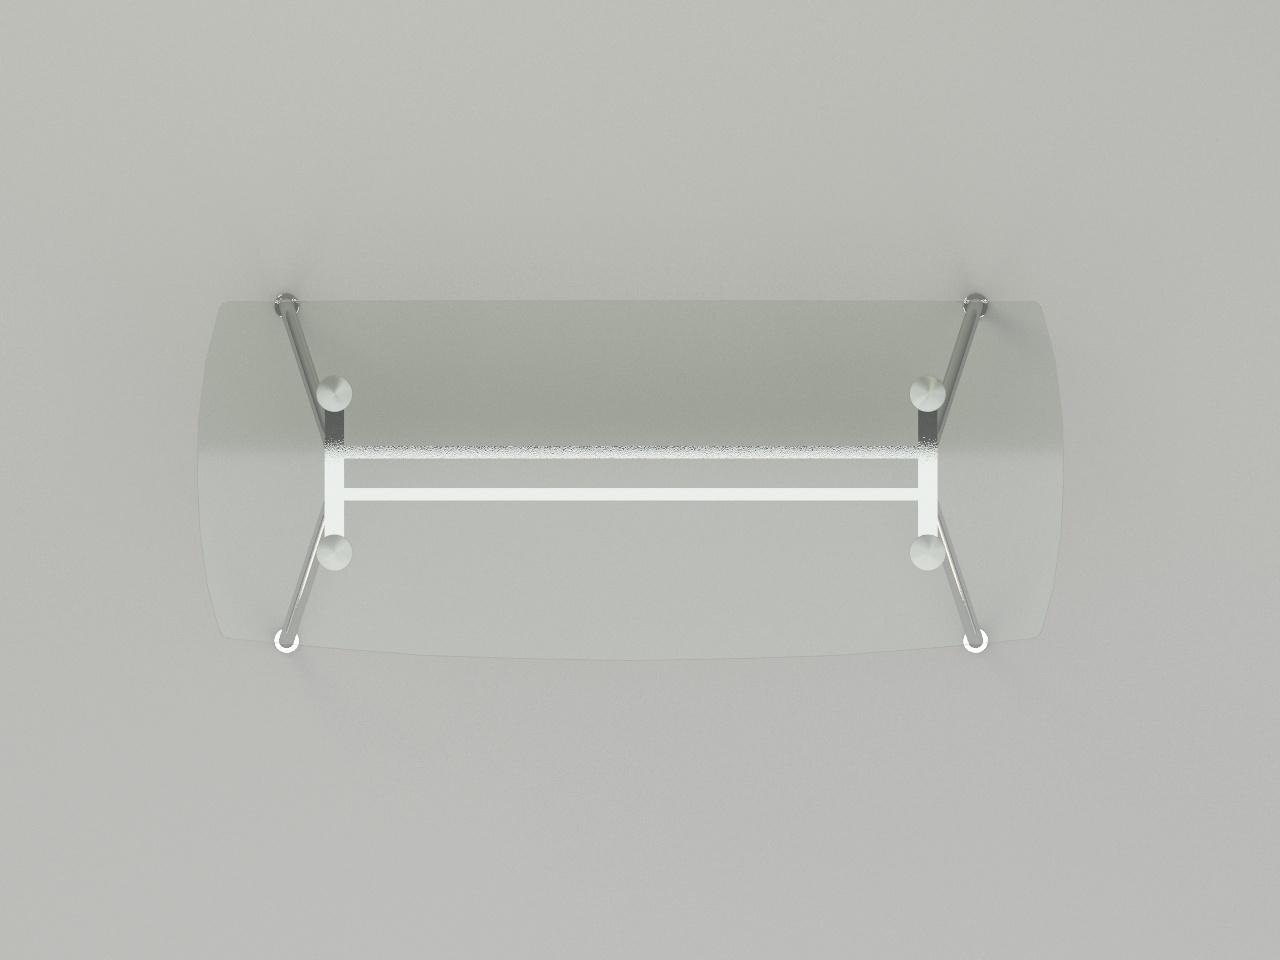 escritorio ejecutivo metal glass 180 x 80 cm